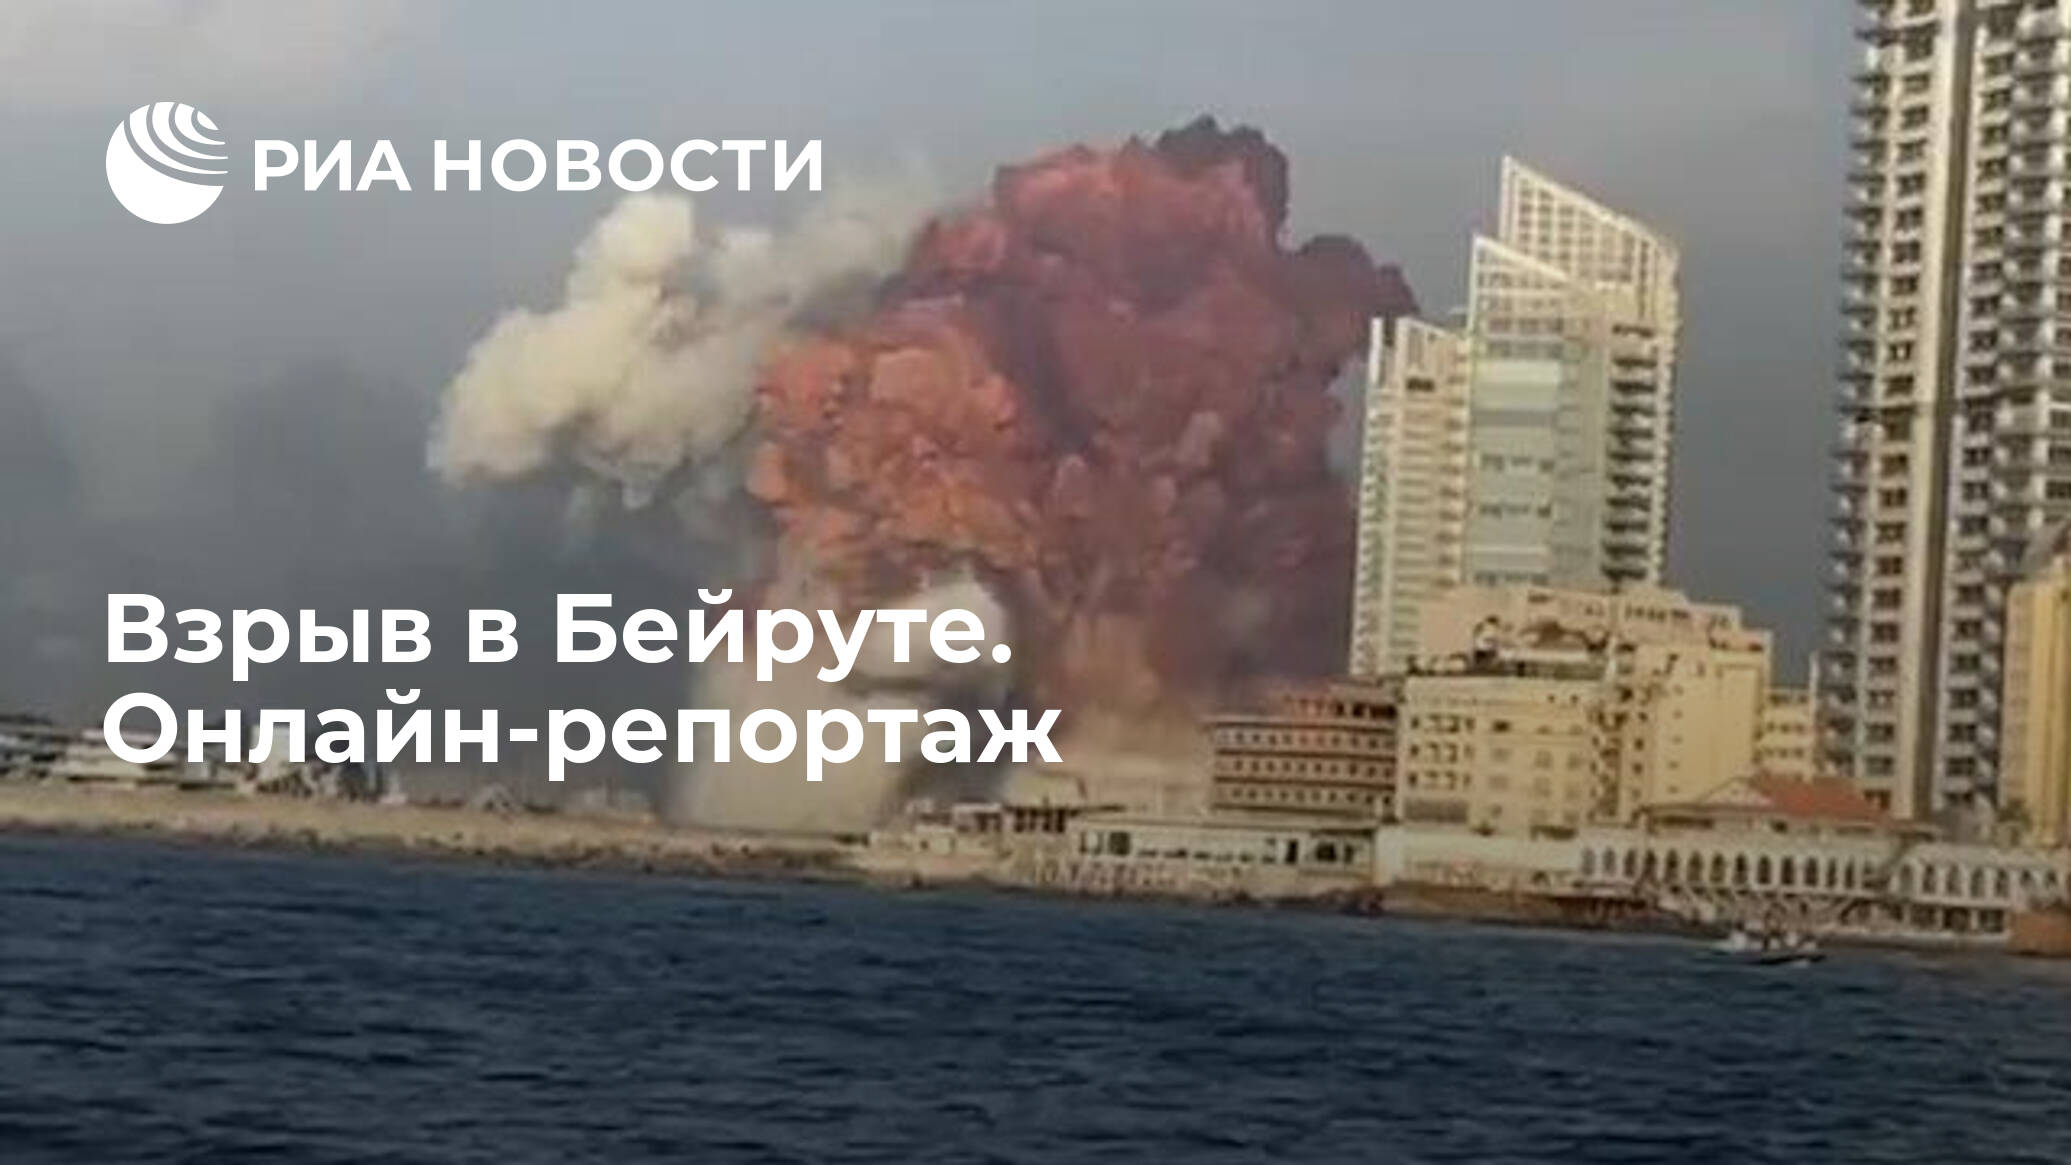 Взрыв в Бейруте. Онлайн-репортаж